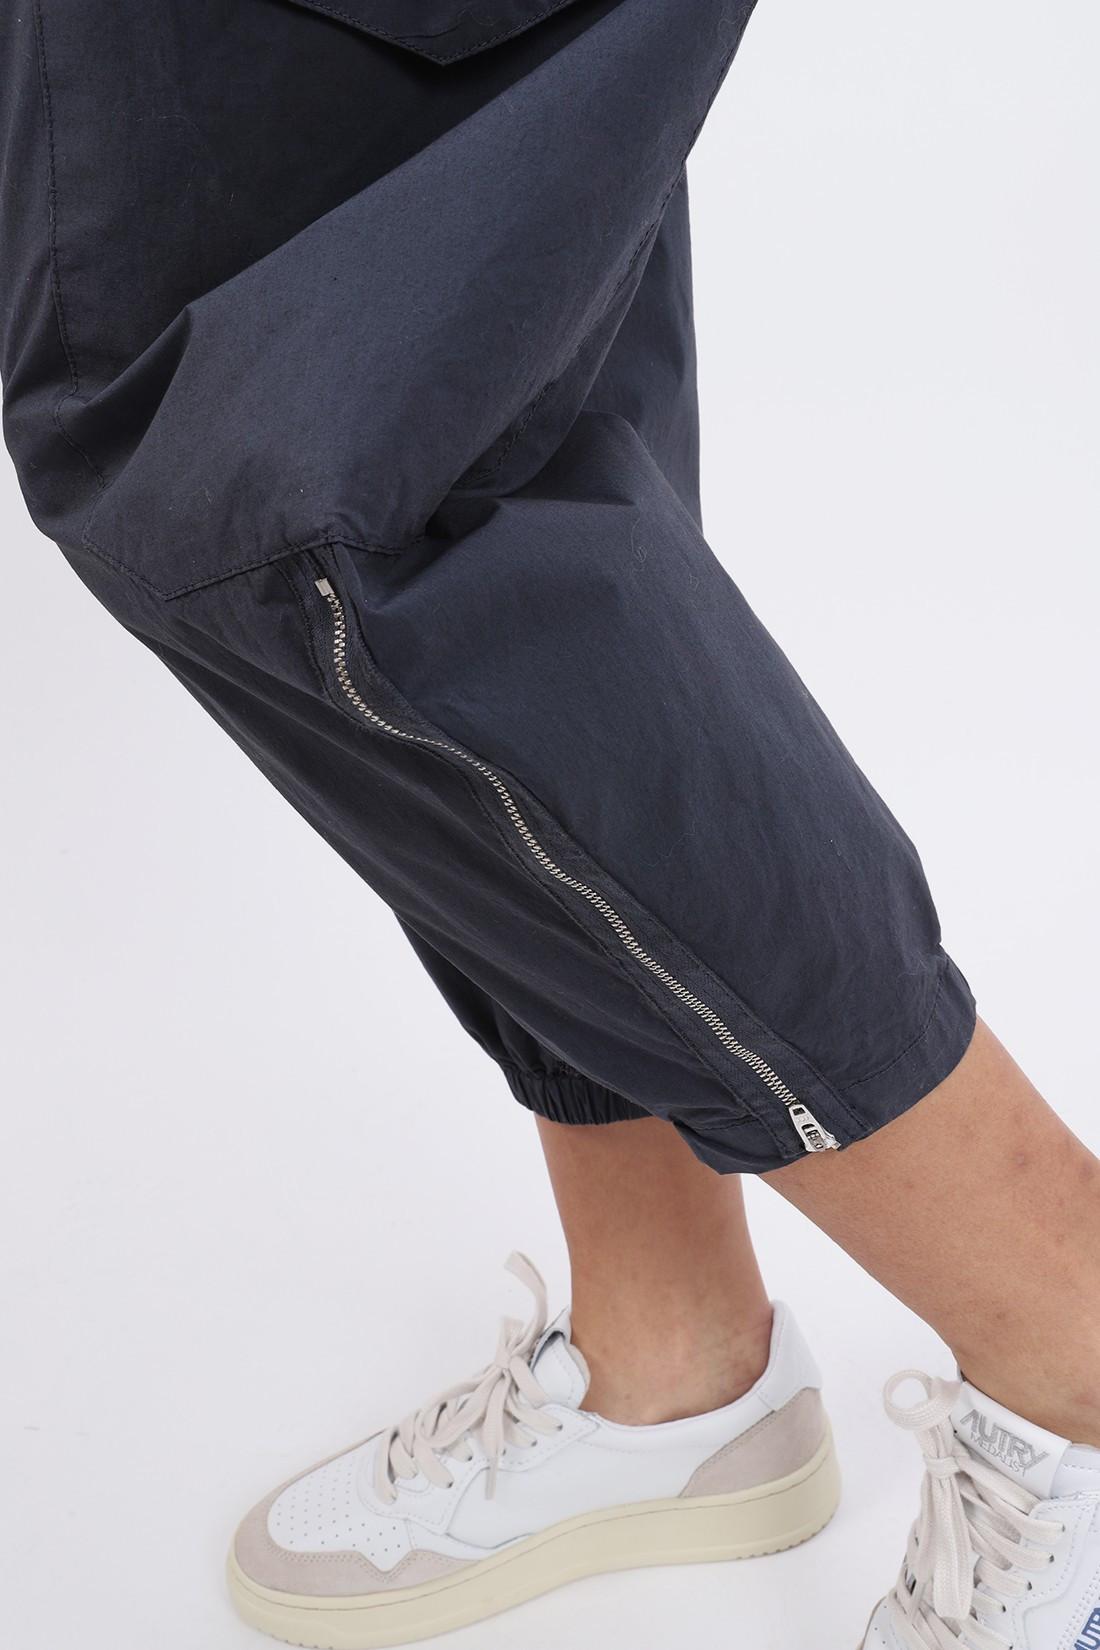 BARENA FOR WOMAN / Pantalon cargo pavion Notte